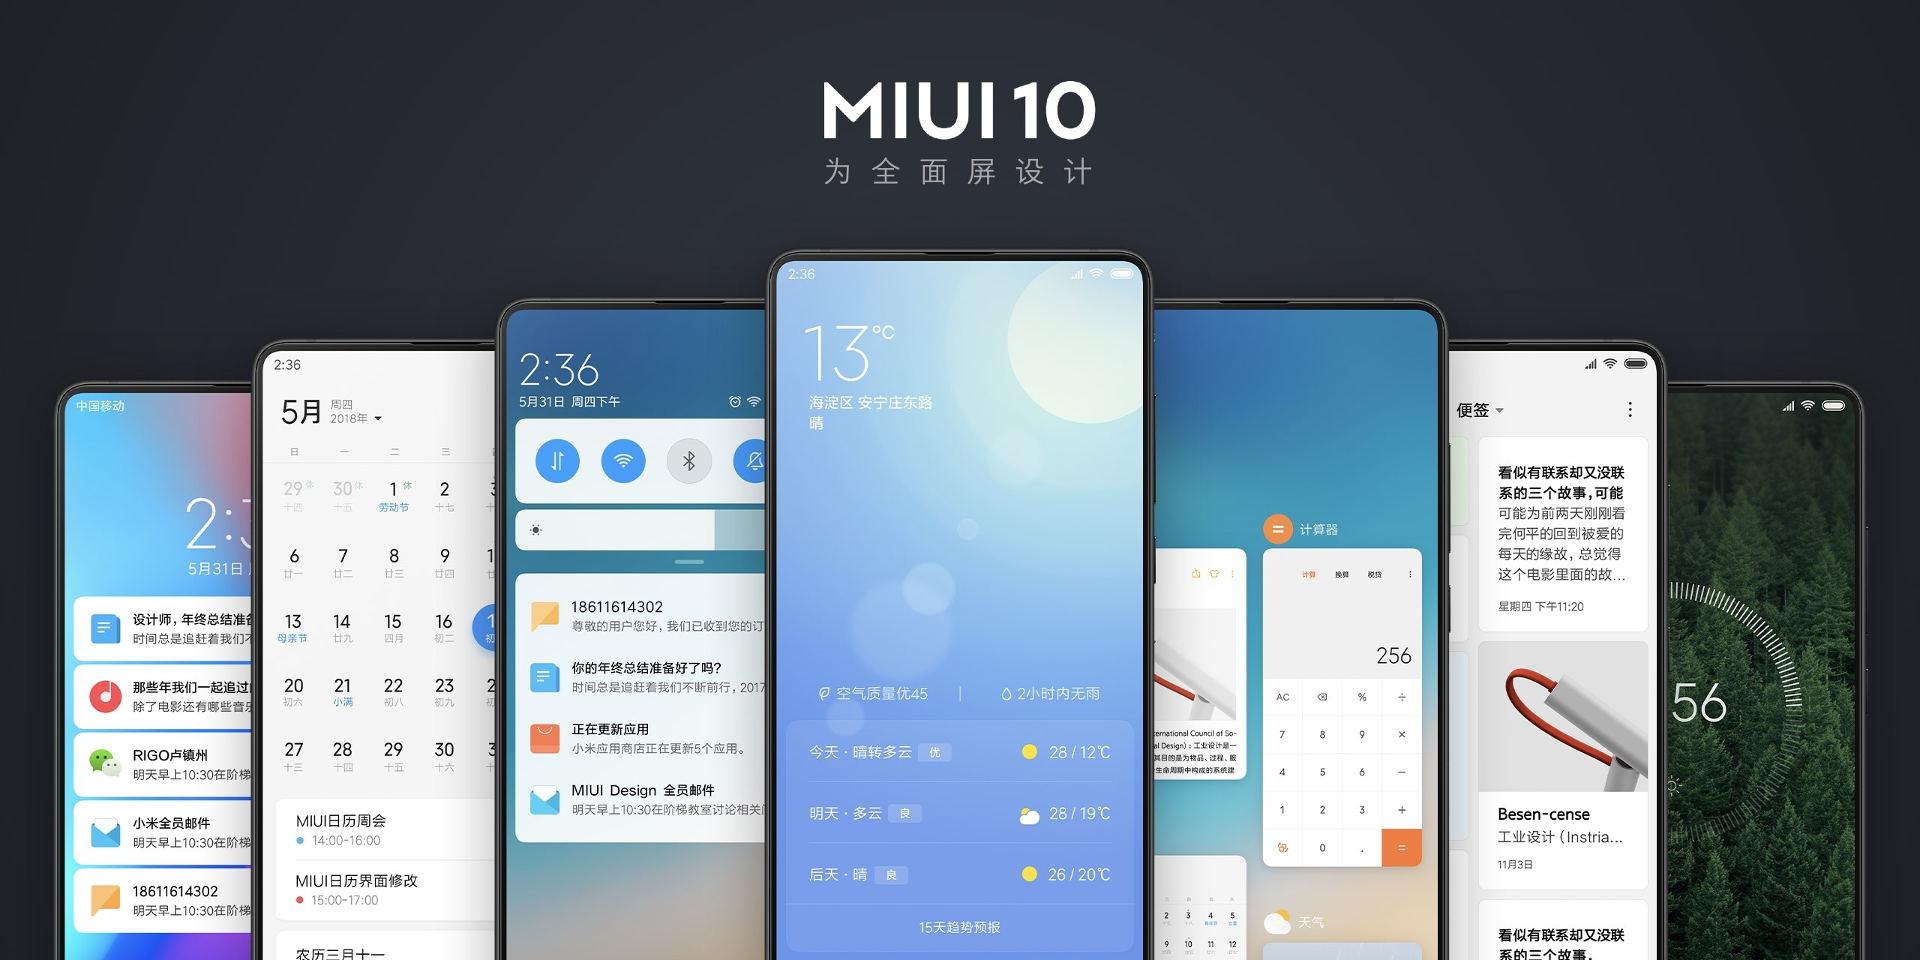 Install MIUI 10 on Any Xiaomi Device